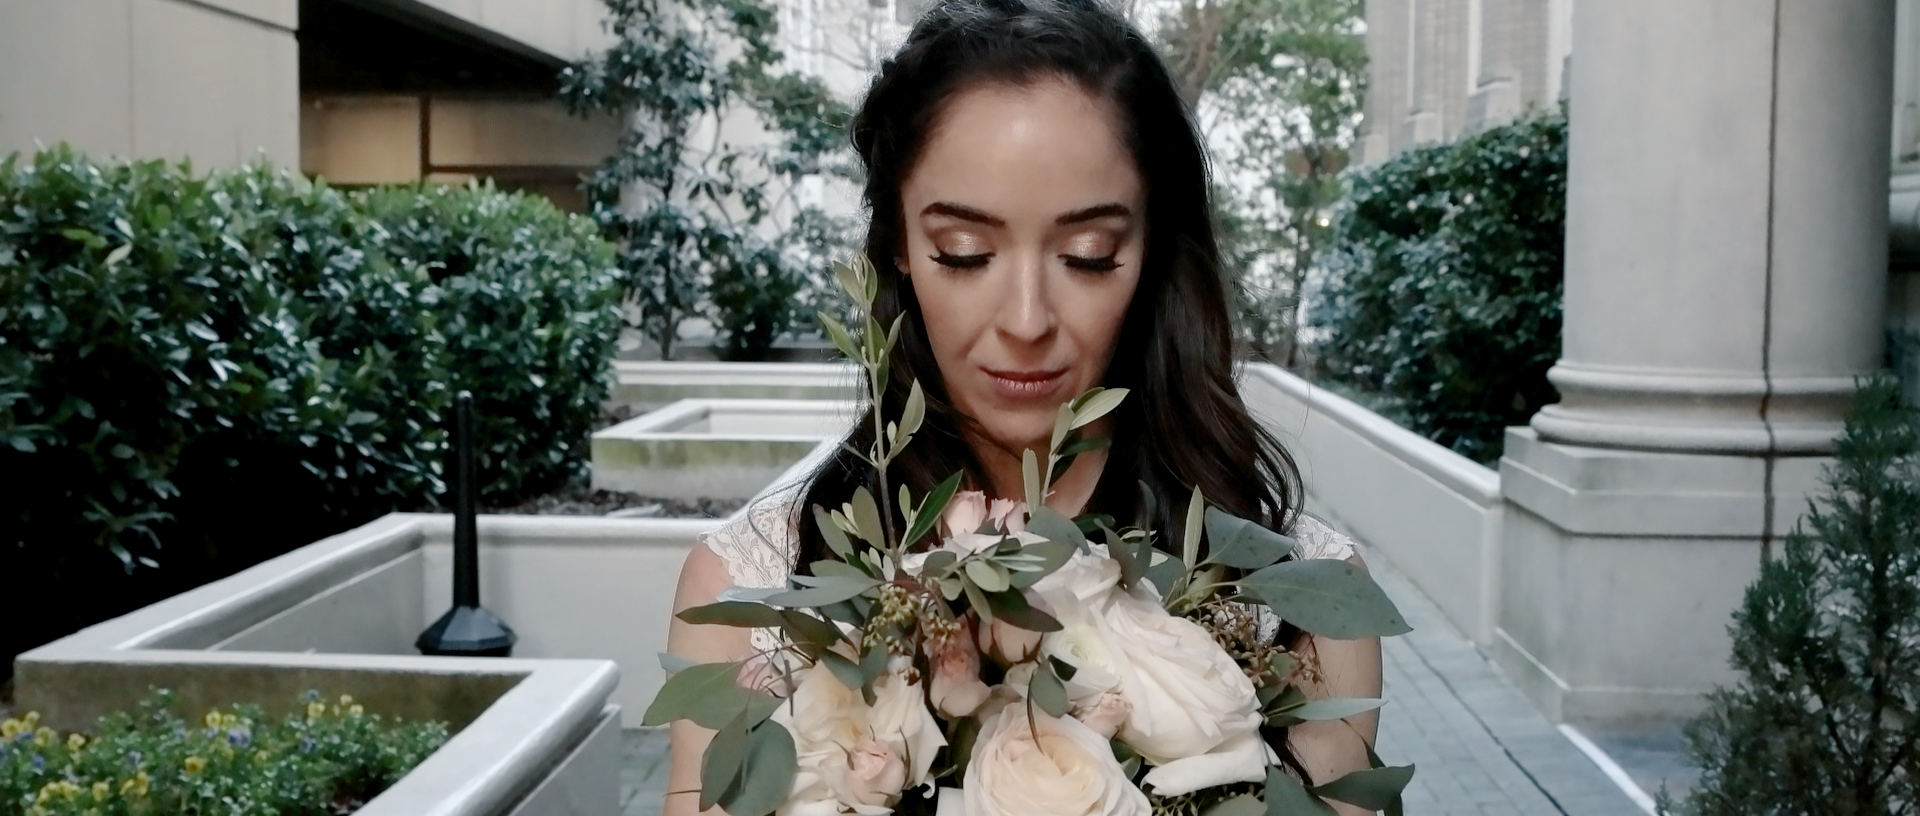 Atlanta Wedding Videographer0015.jpg